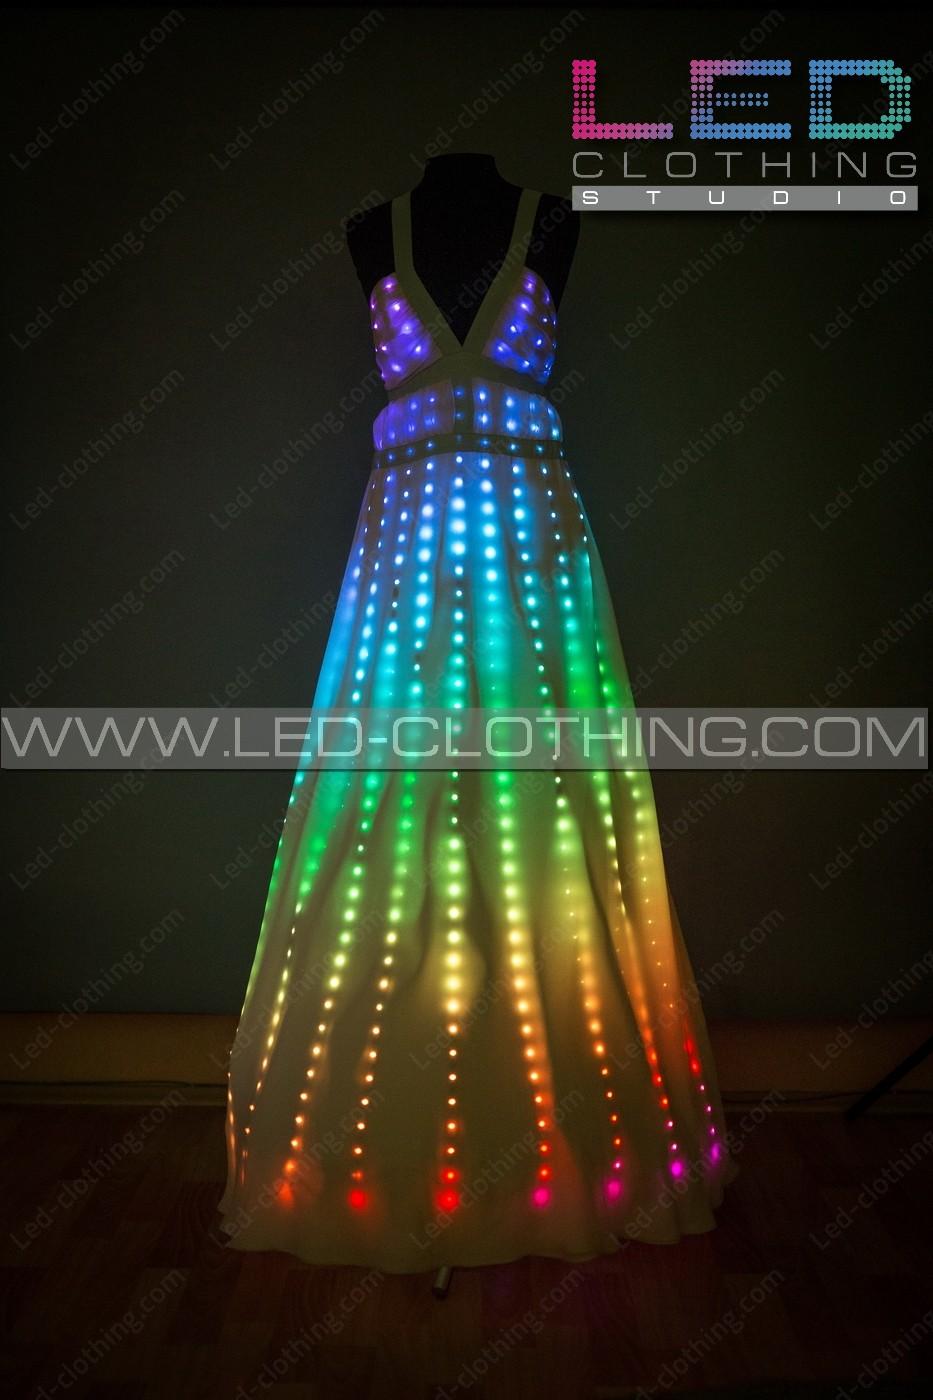 Digital Pixel Aurora Led Dress With Wireless Control Led